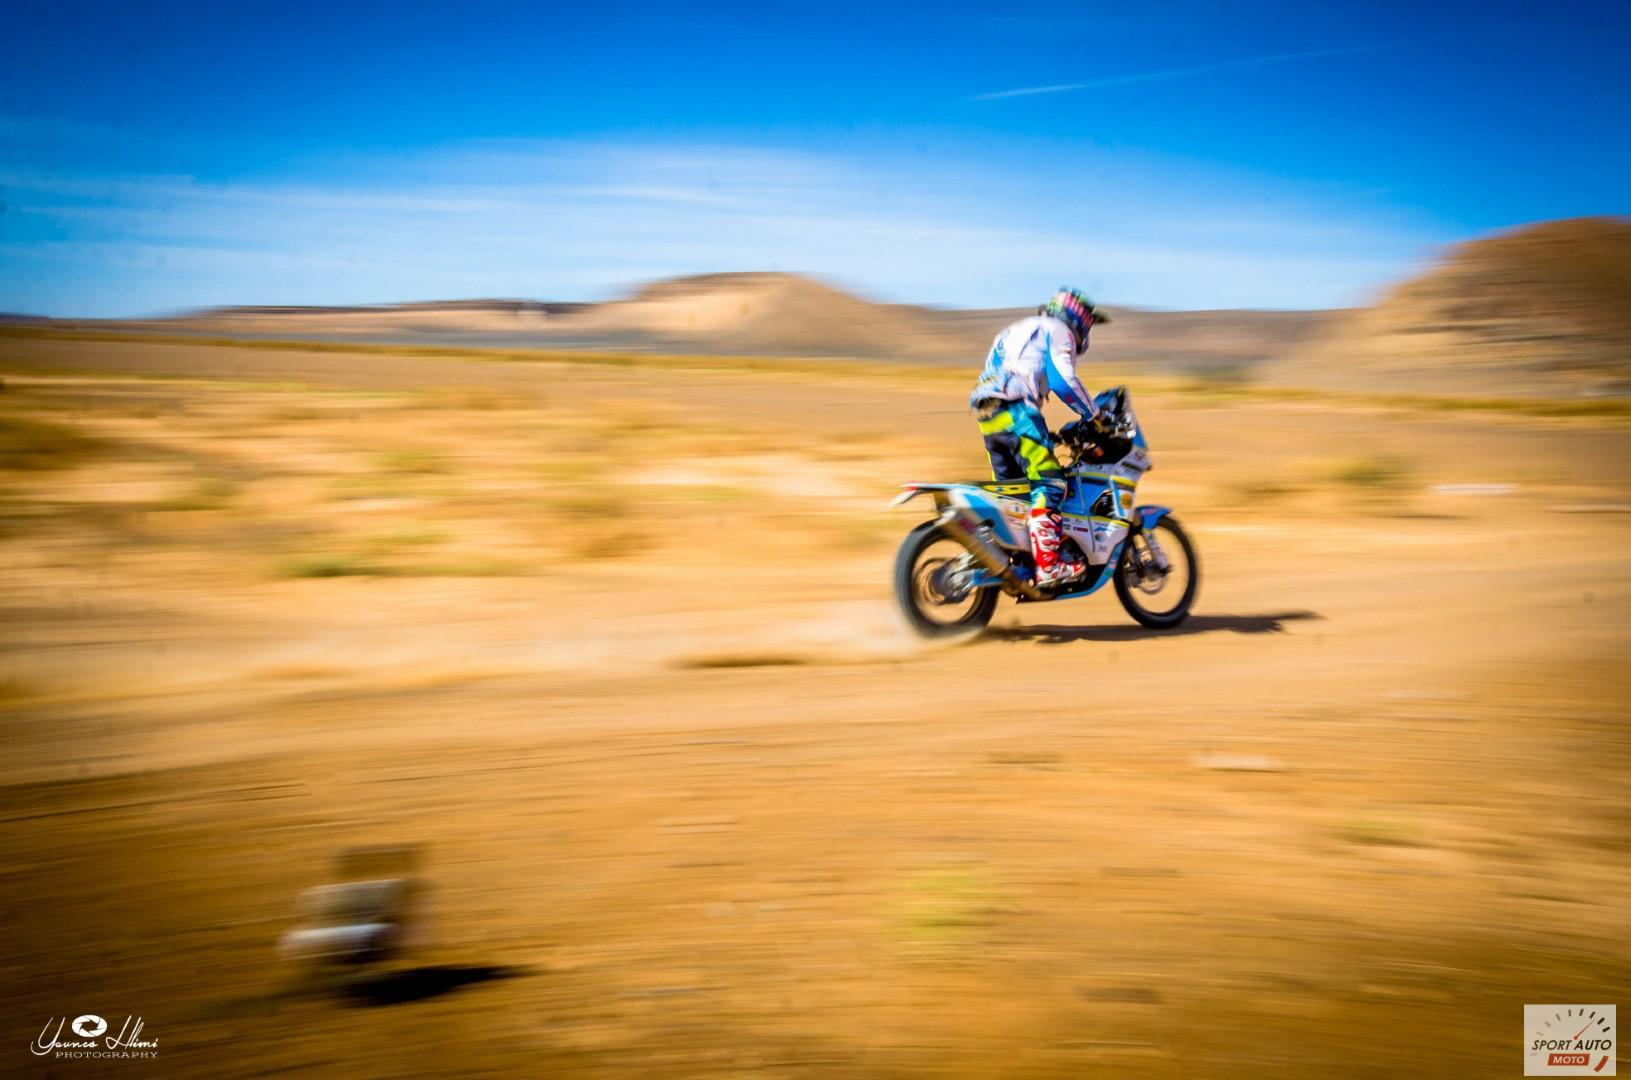 rallye-hearts-of-morrocco-2017-victoire-de-lionel-baud-sur-la-plus-longue-etape-du-rallye-448-4.jpg